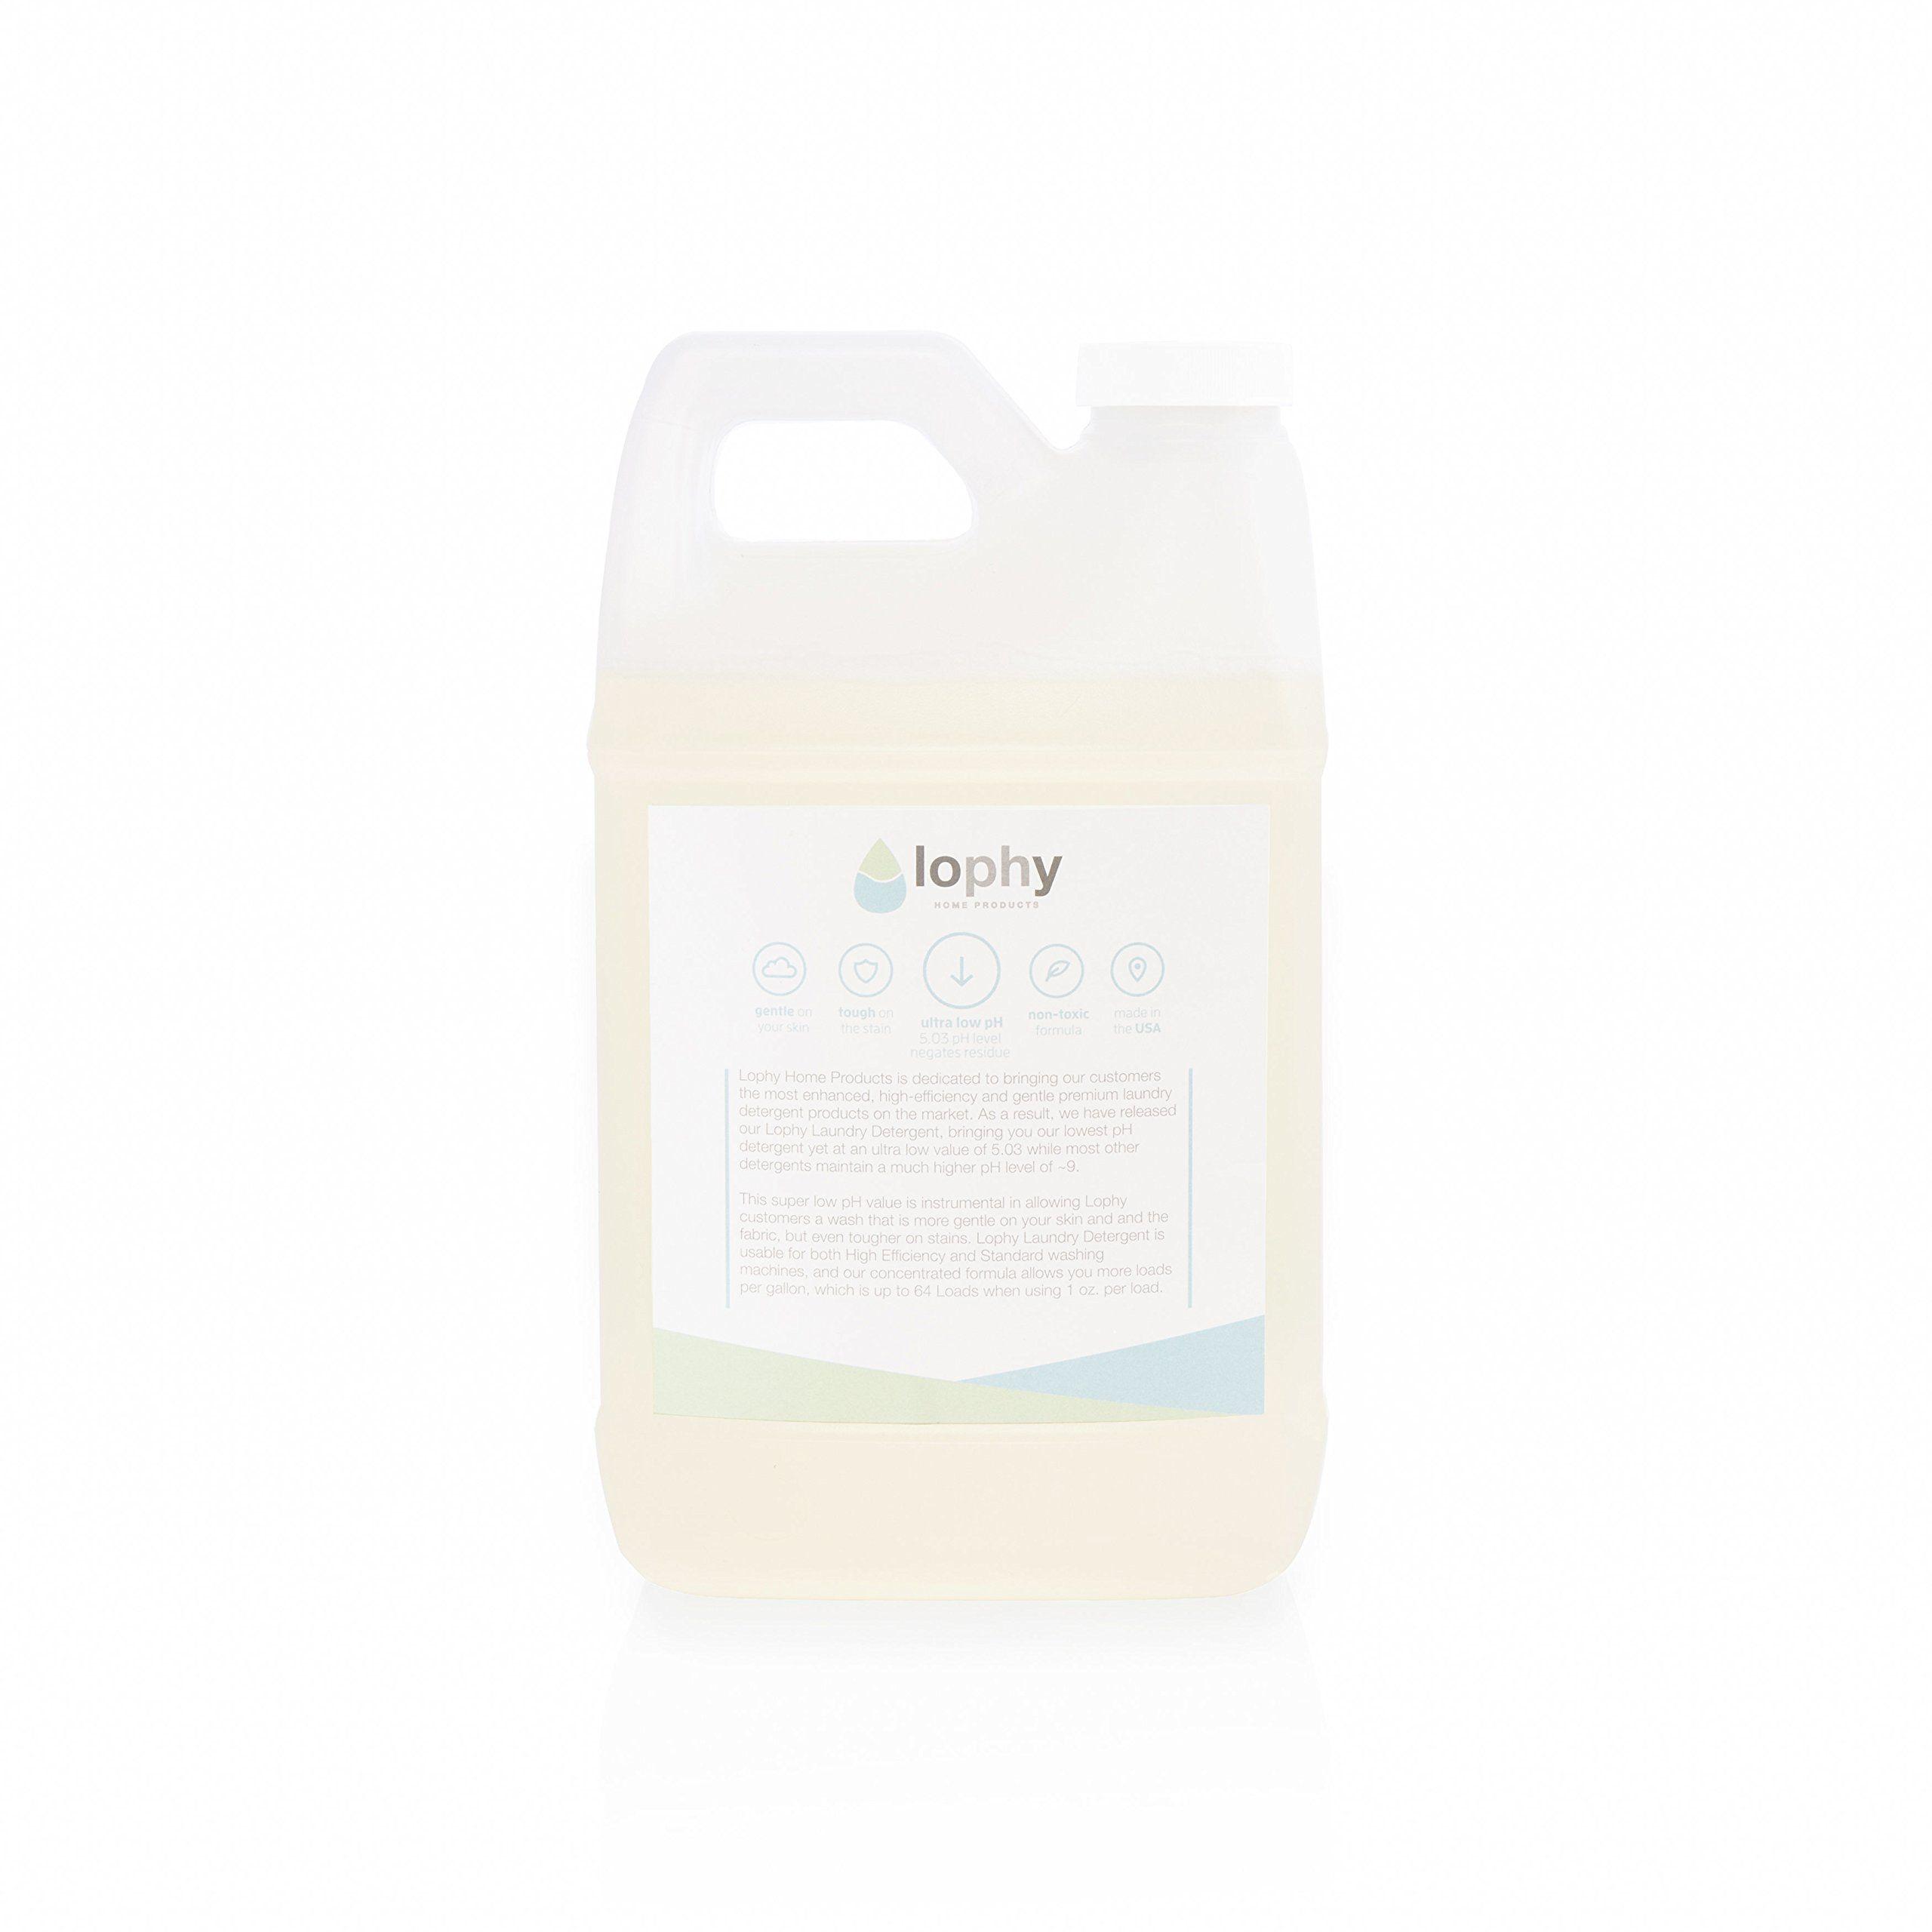 Lophy Low Ph Laundry Detergent Soap Free Detergent Soap